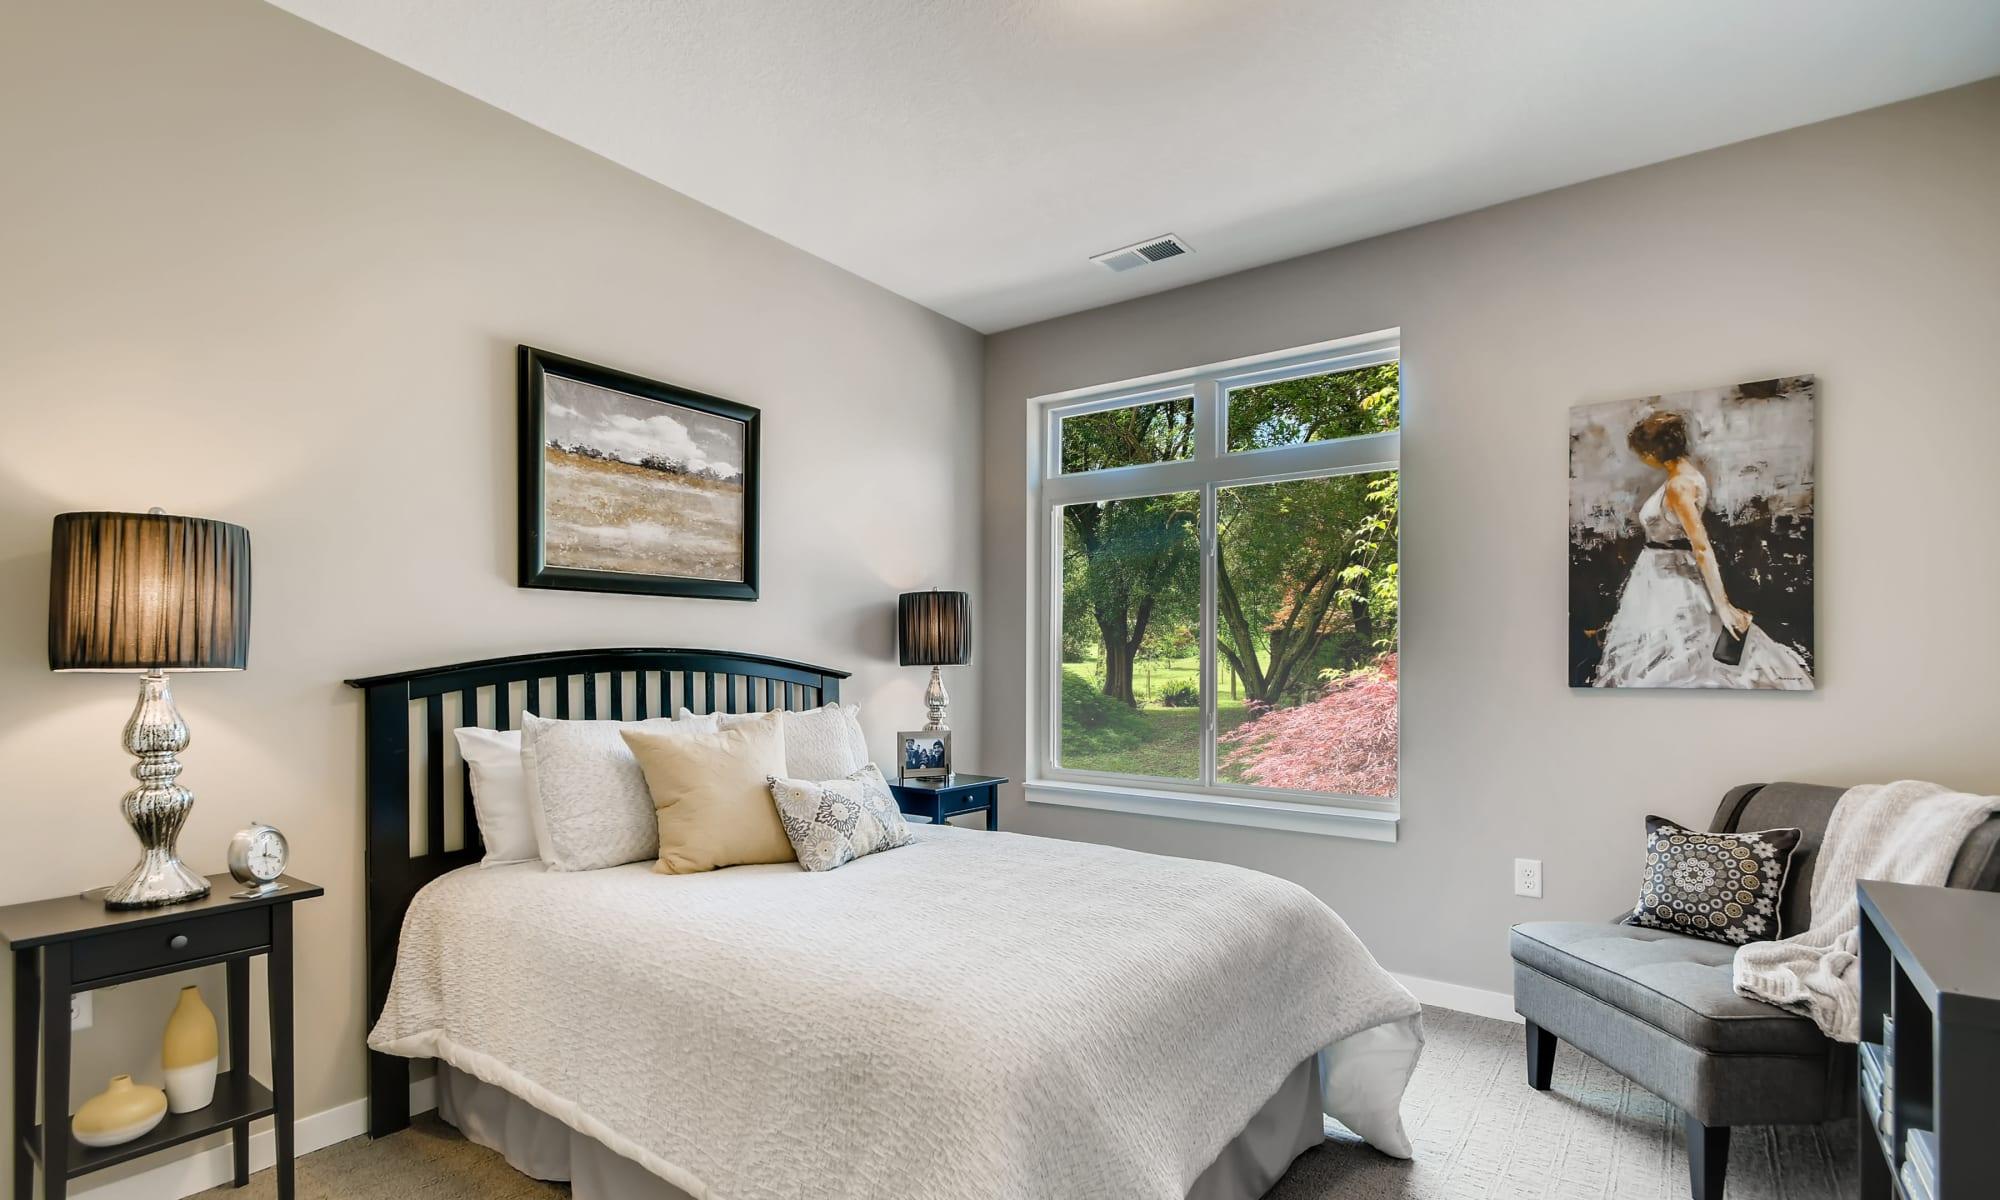 Bedroom at Broadwell Senior Living